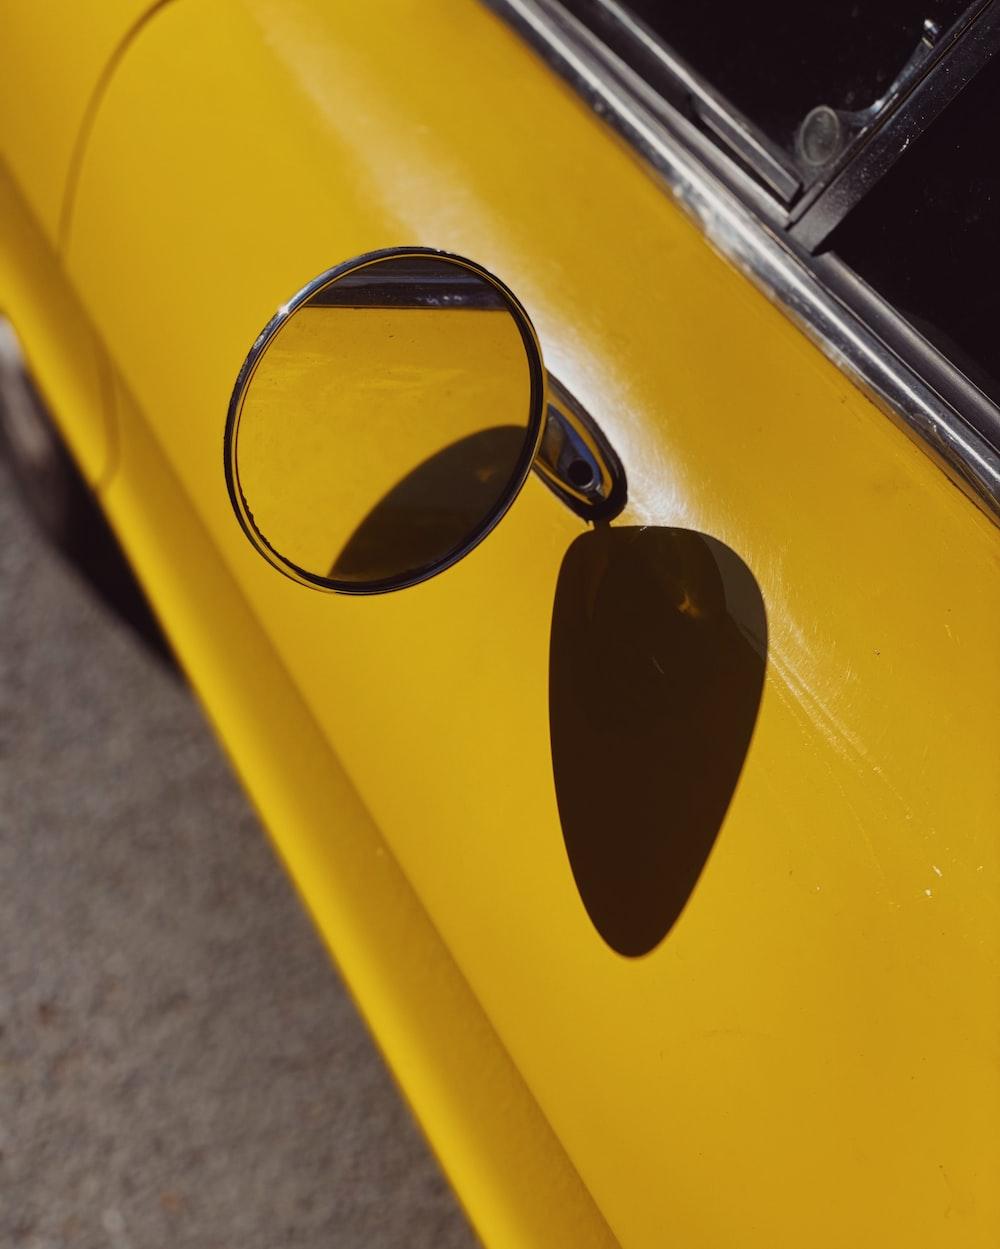 black sunglasses on yellow car